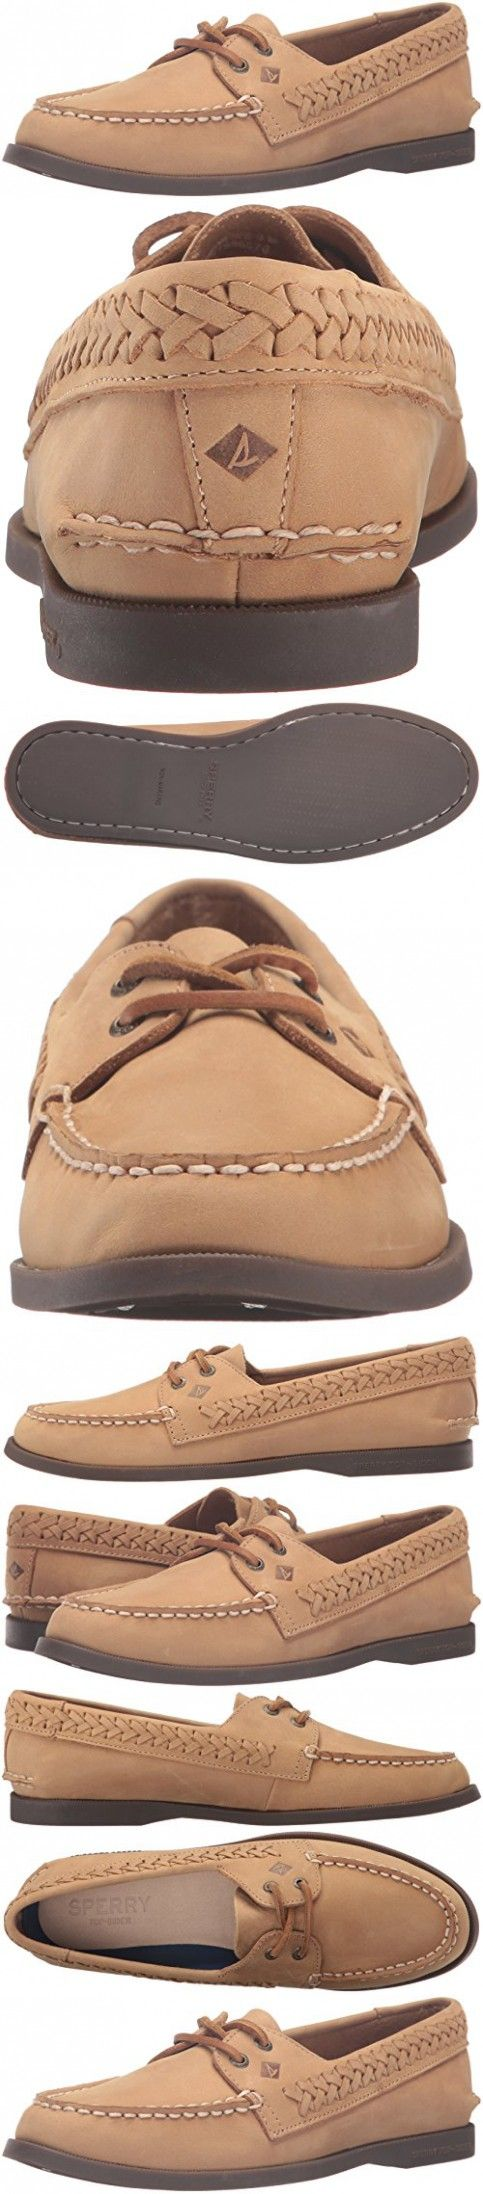 Sperry Top-Sider Women's Ao Quinn Boat Shoe, Tan, 8.5 M US